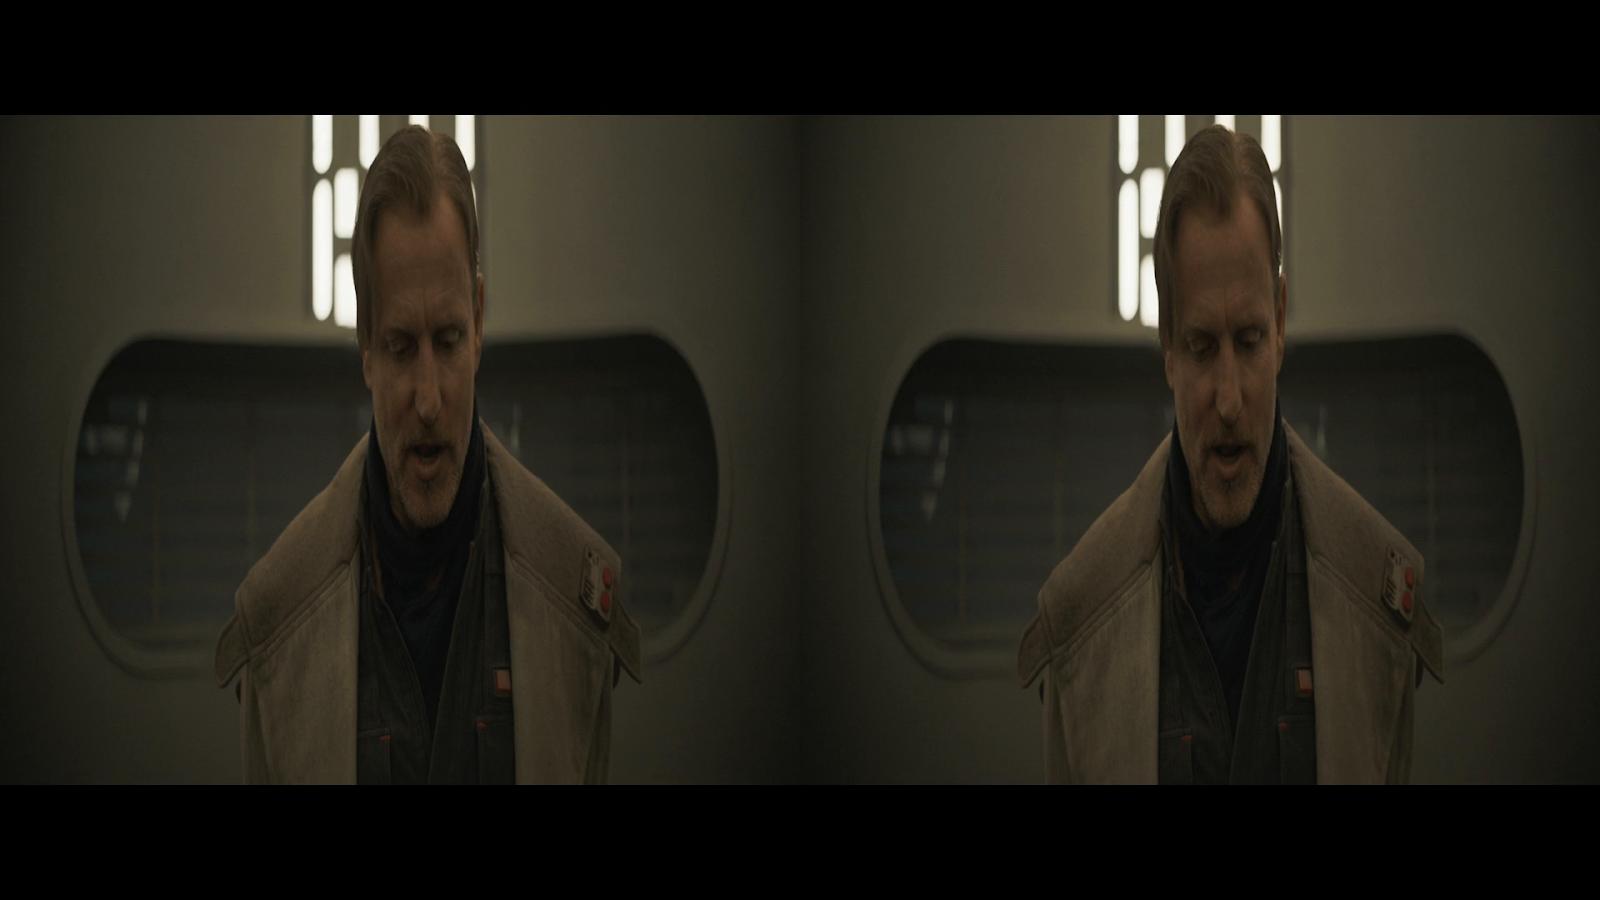 Han Solo: Una historia de Star Wars (2018) 3D SBS Full 1080p Latino-Castellano-Ingles captura 2